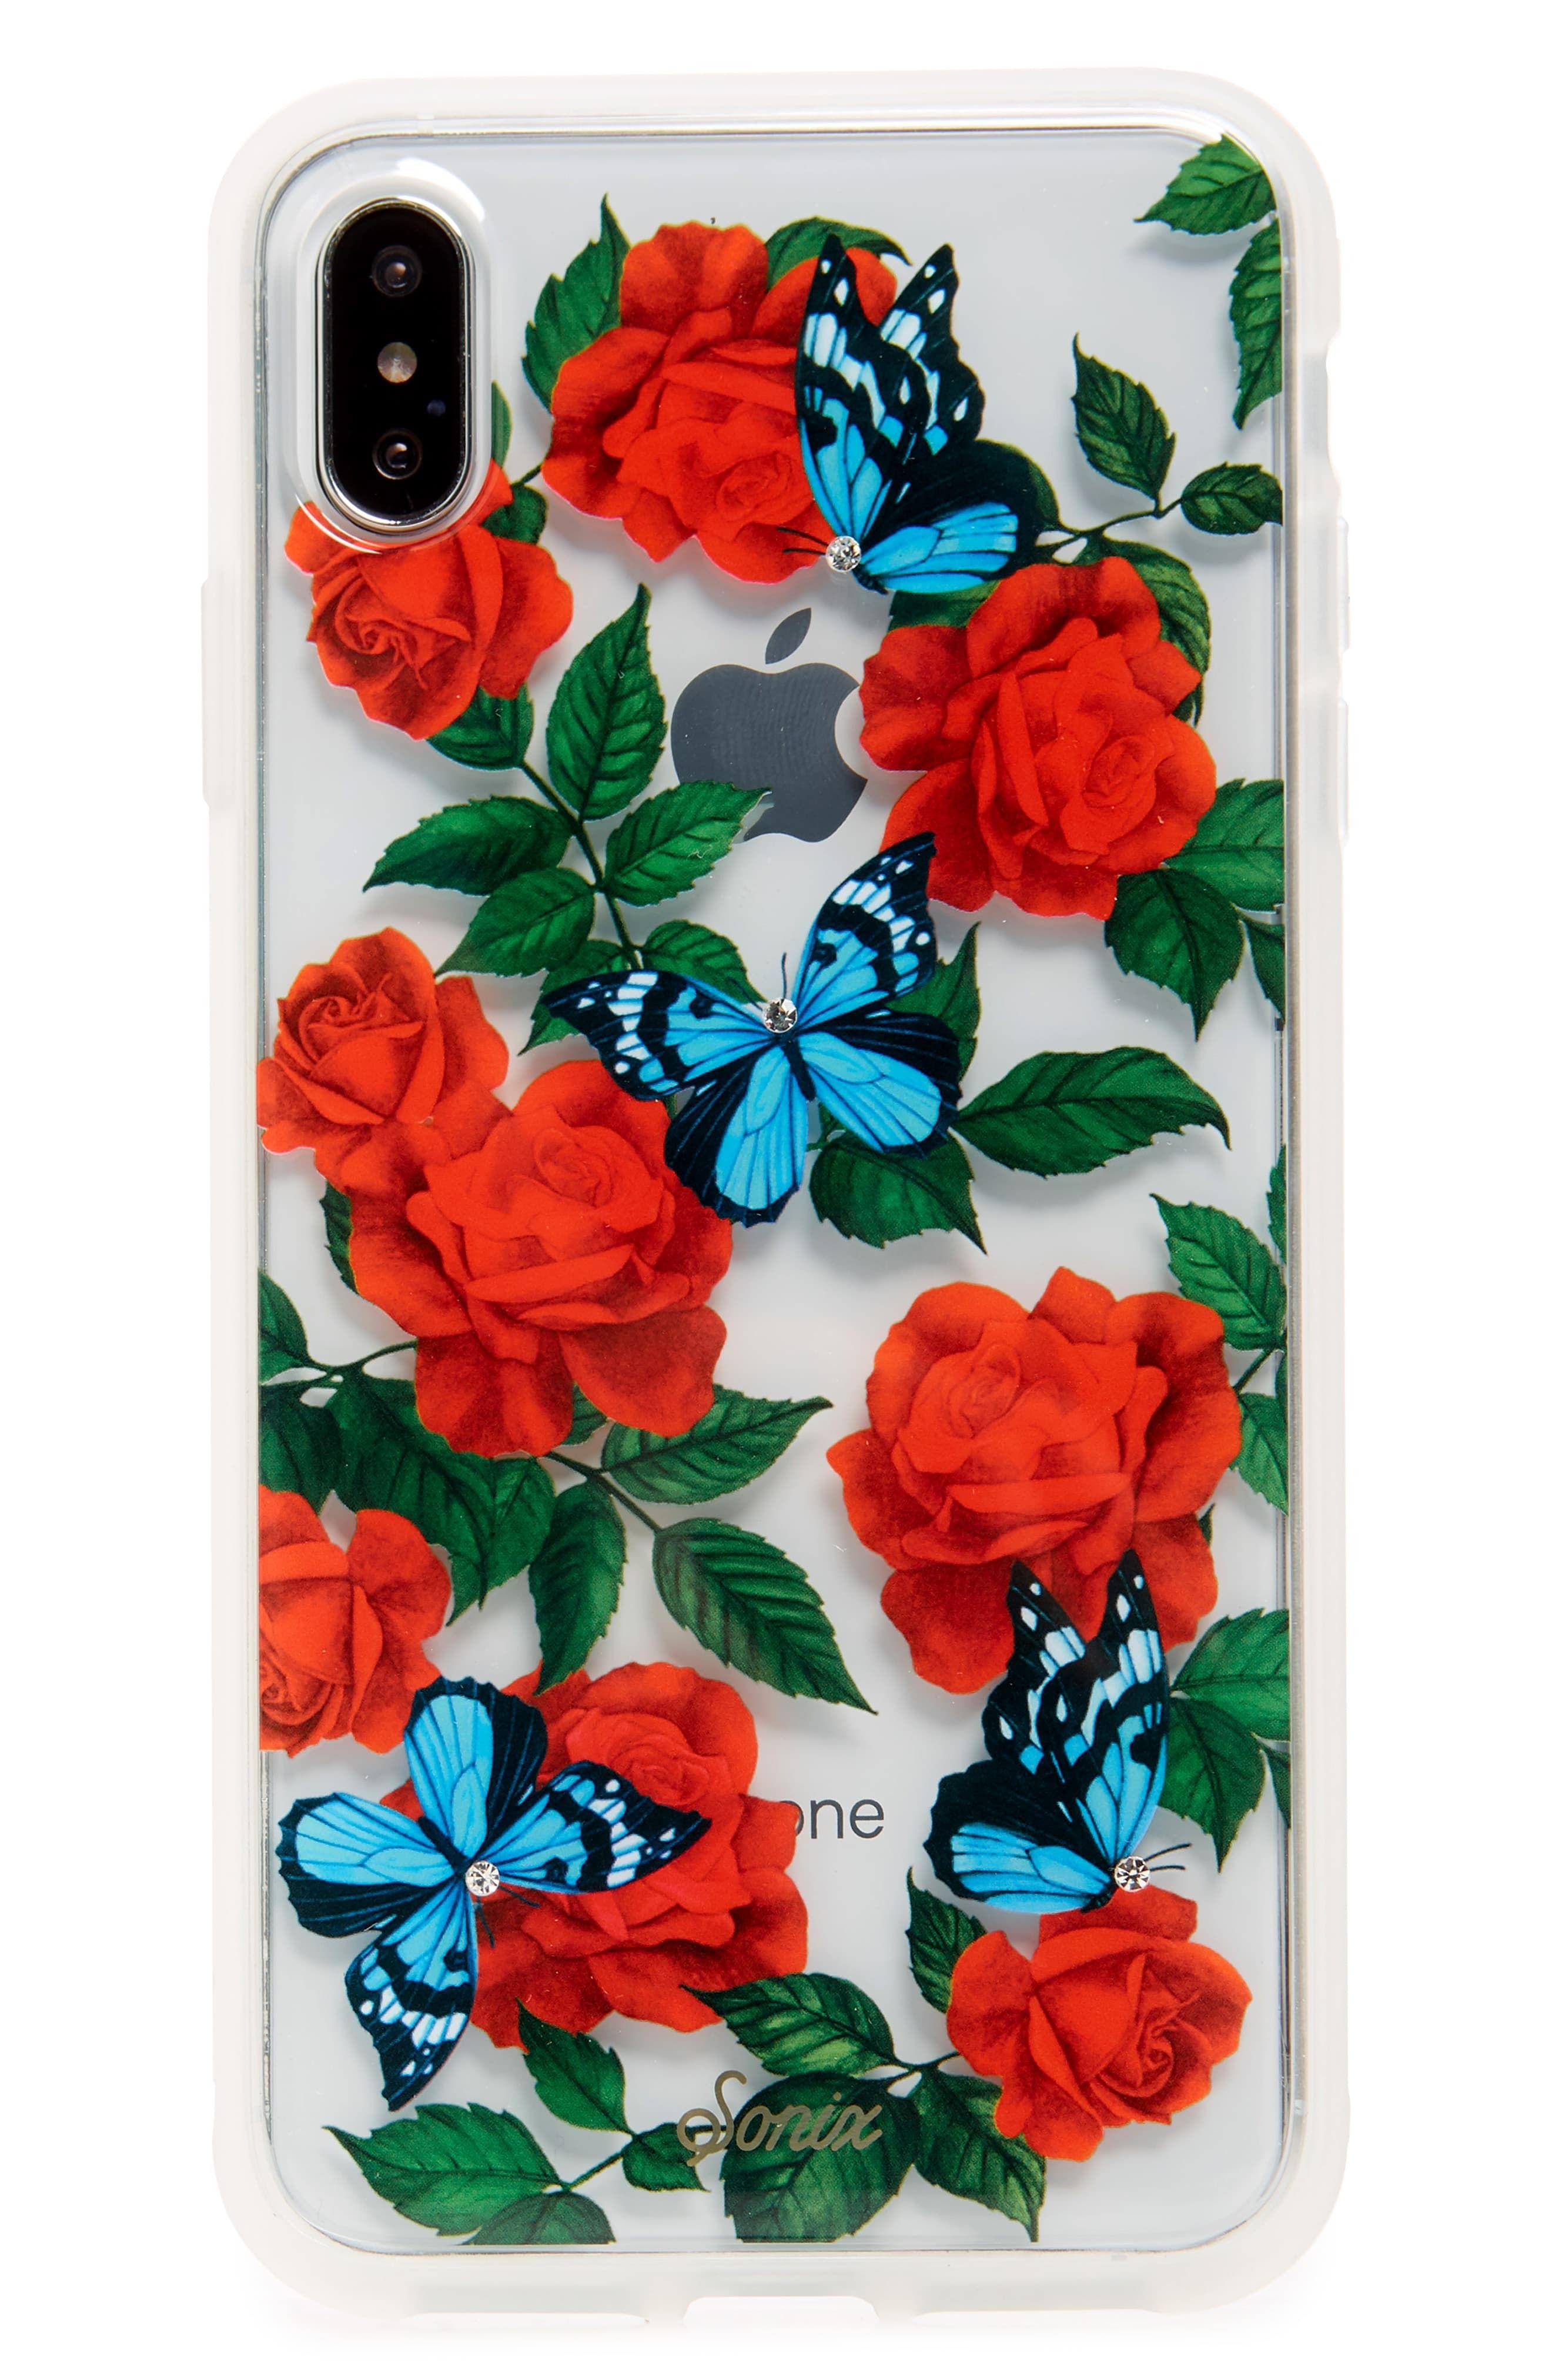 Sonix butterfly garden iphone xxs xr x max case in